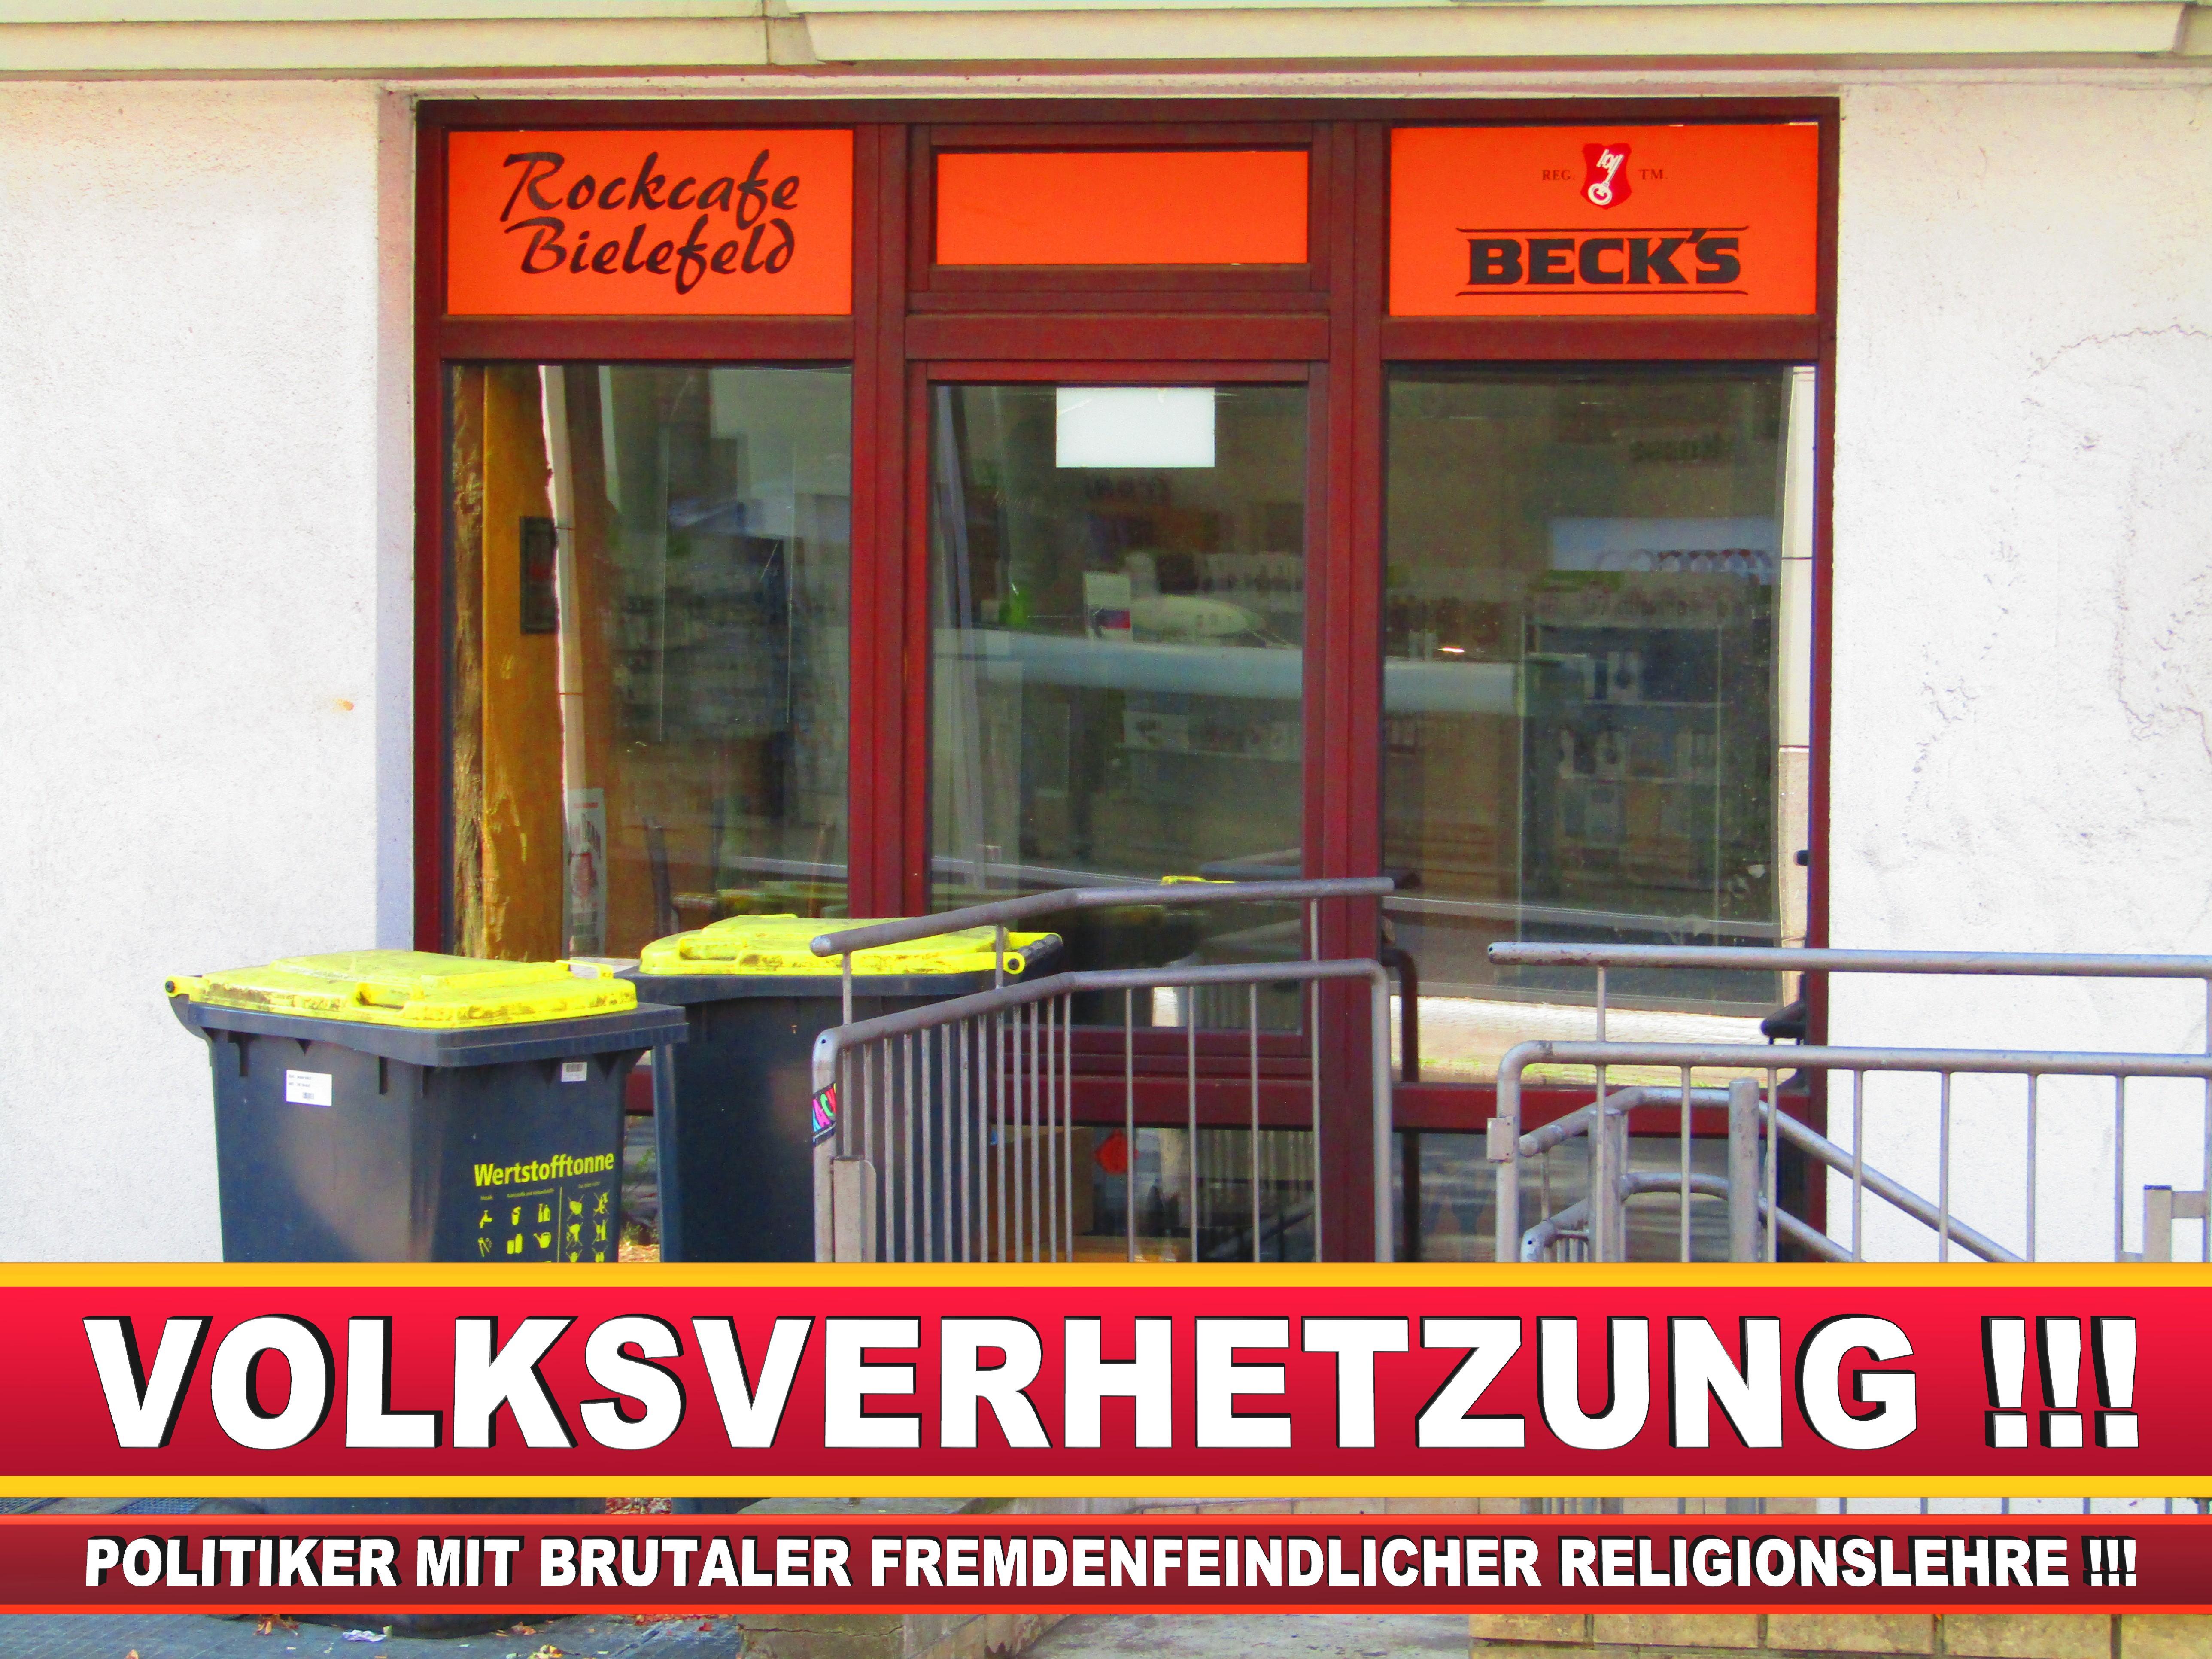 ROCK CAFE BIELEFELD CDU BIELEFELD Inhaber Niklas Meyer Und Markus Prange (1) LANDTAGSWAHL BUNDESTAGSWAHL BÜRGERMEISTERWAHL